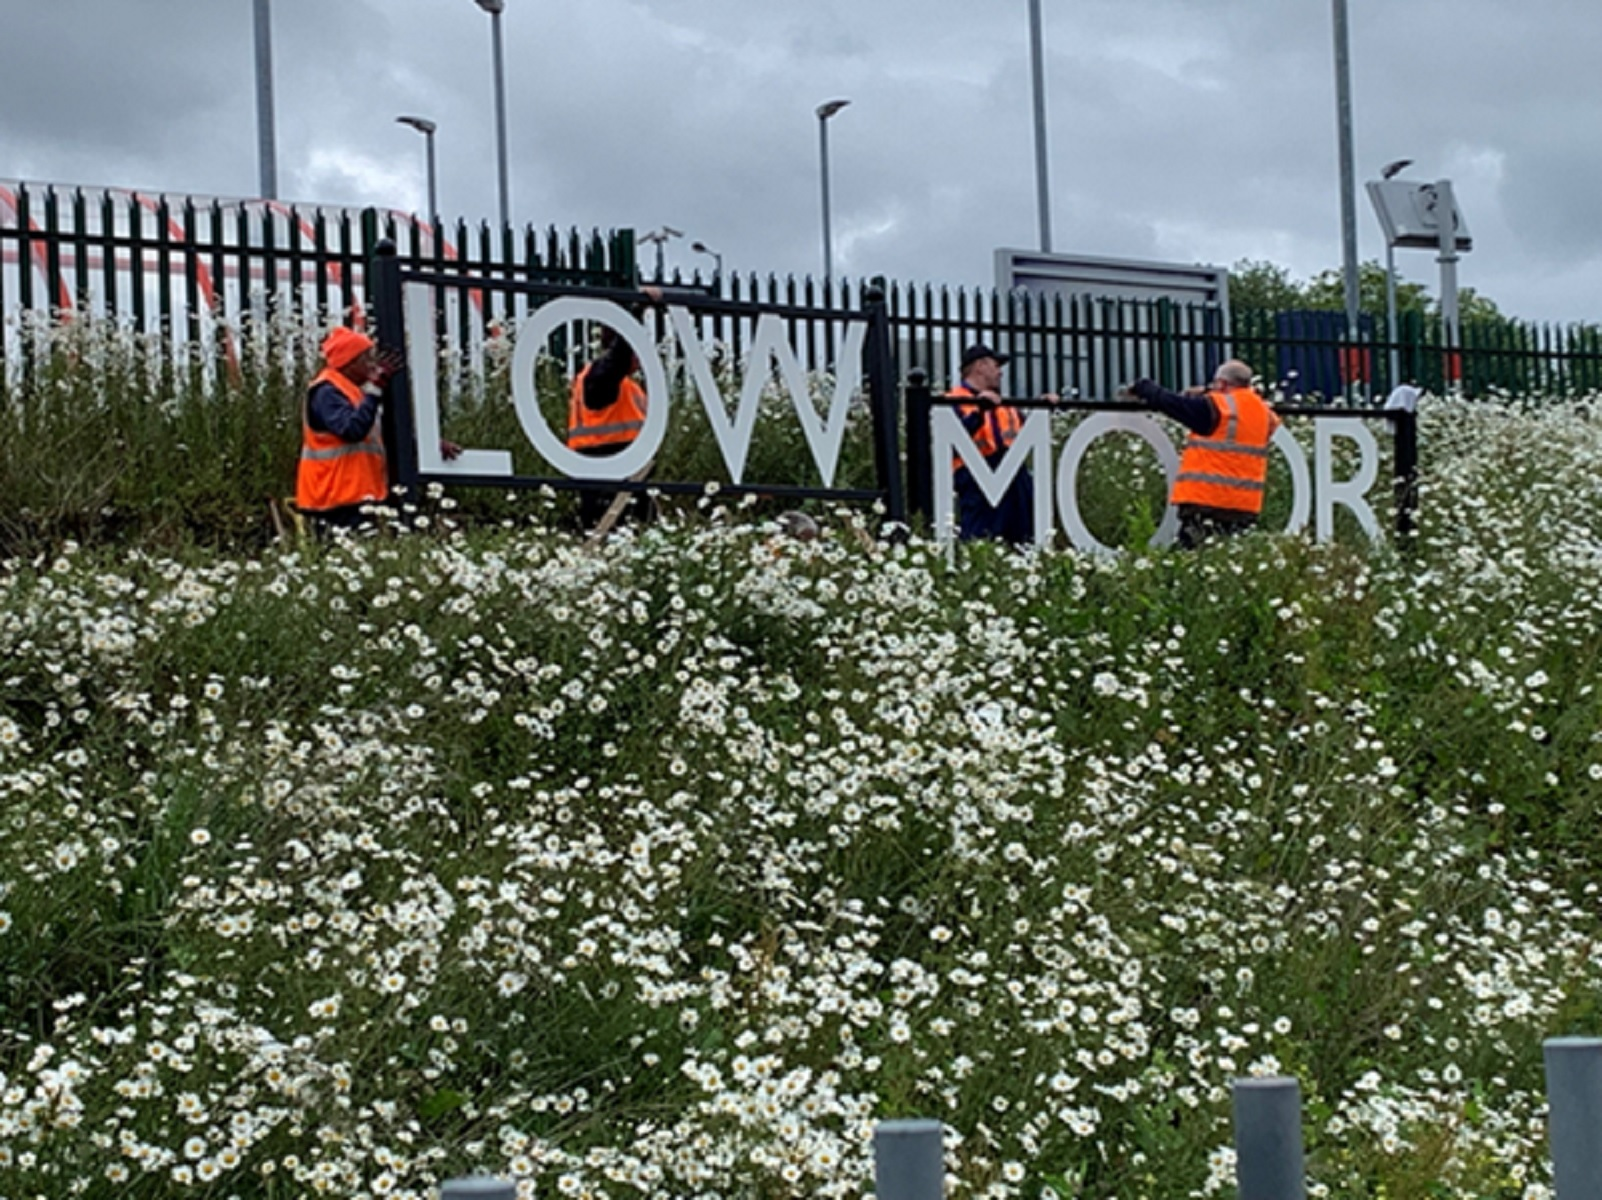 Bradford's Low Moor station given platform for publicity